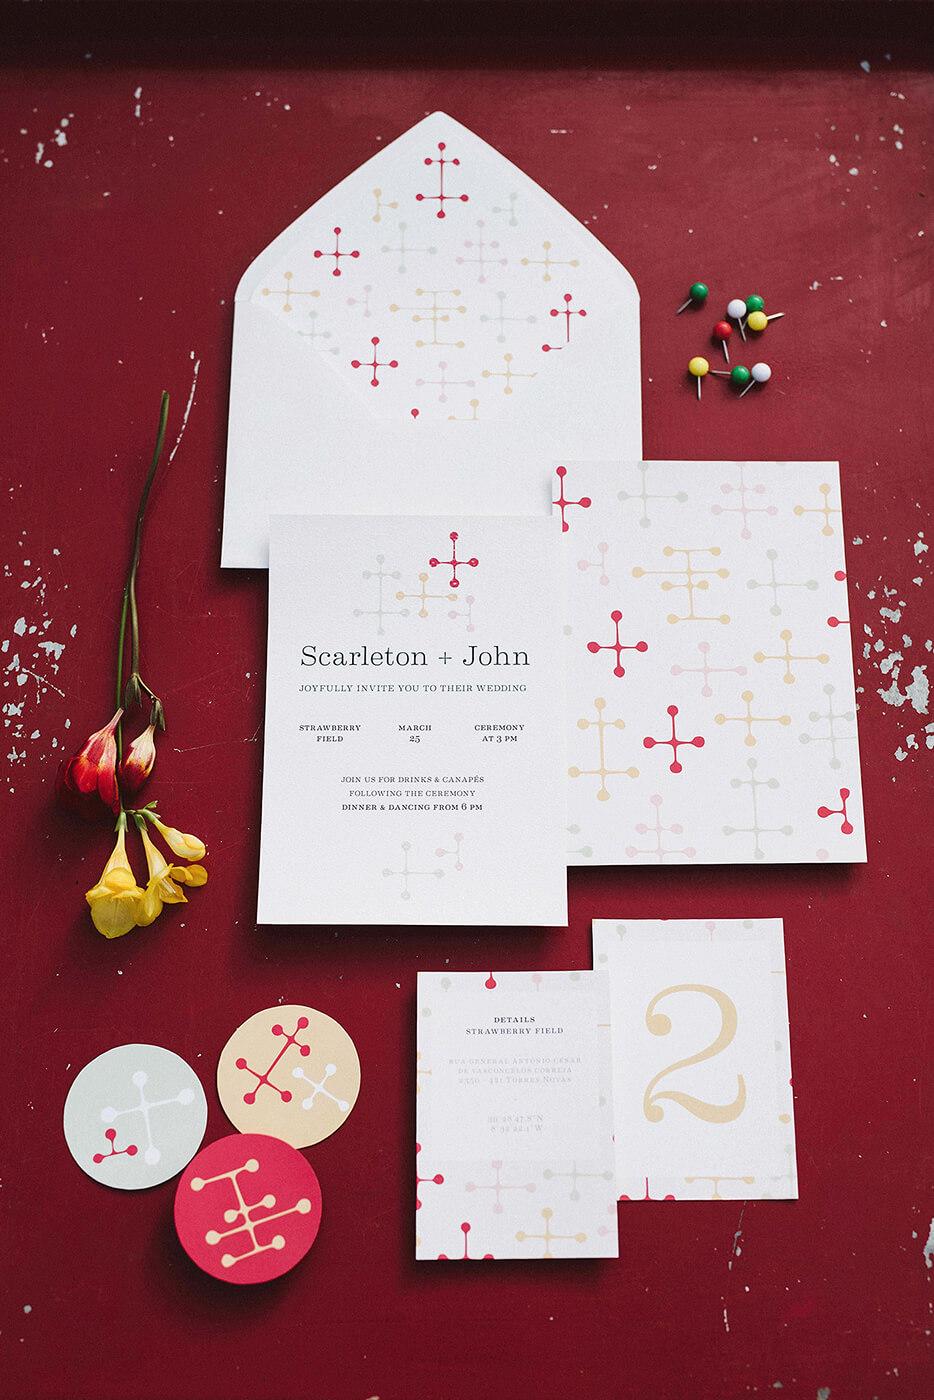 roma-organizacao-eventos-editorial-mid-century-modern-wedding-in-a-strawberry-field-35